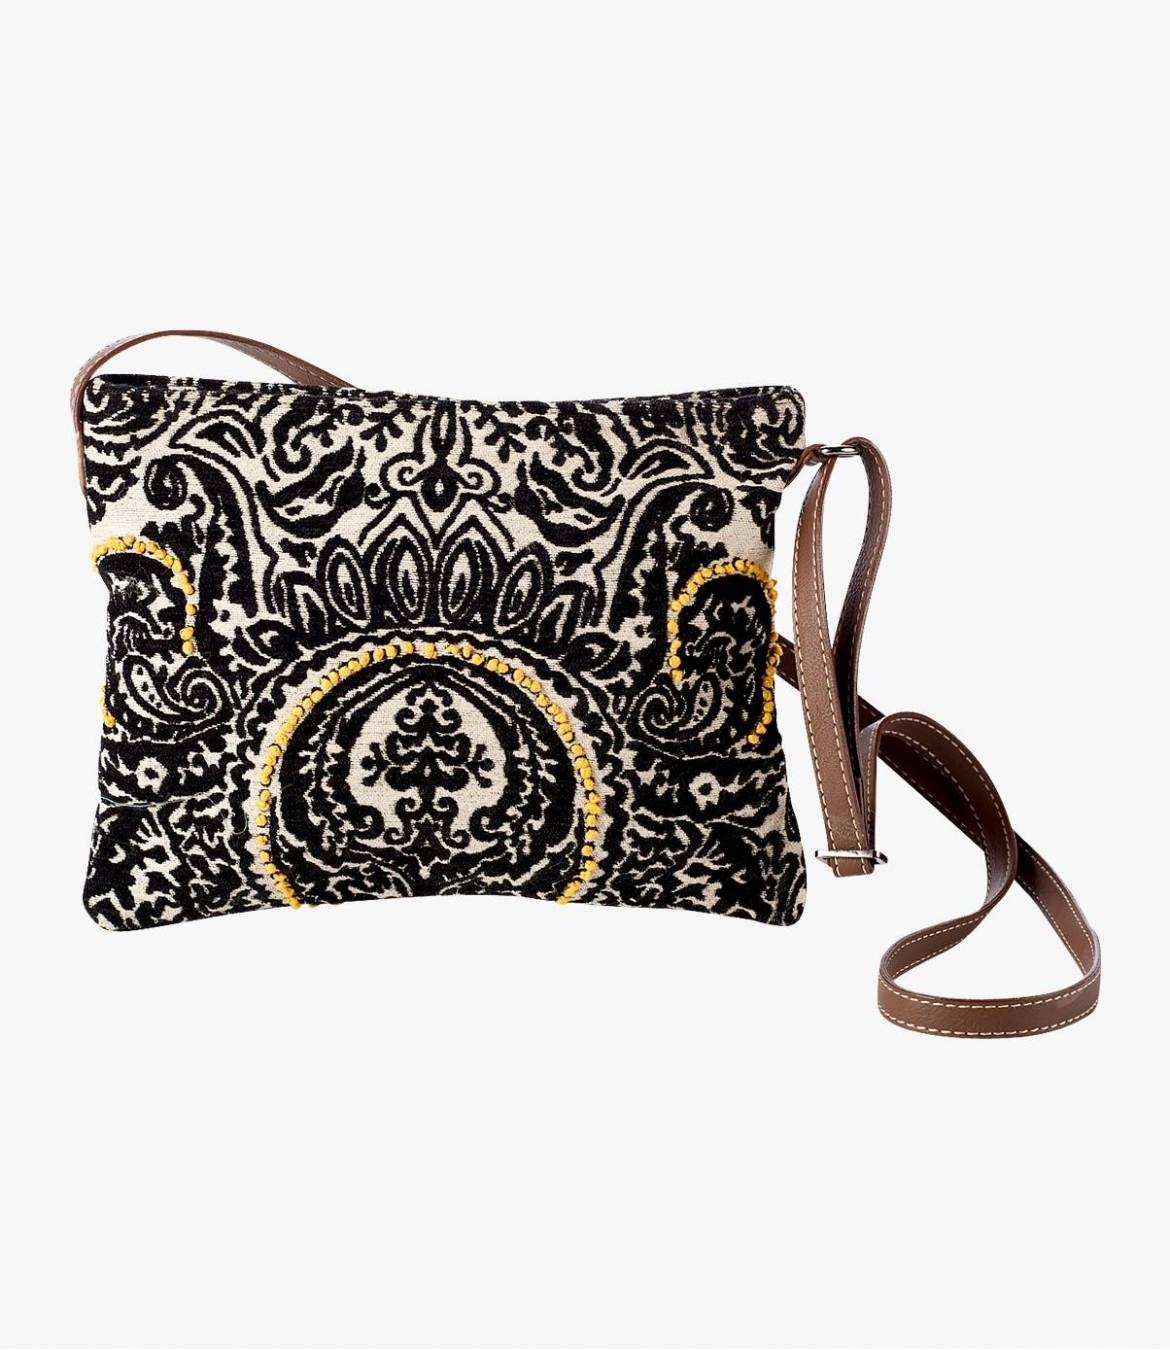 AFI IMP Cotton Bag, PU for Women 28x32 cm Storiatipic - 6